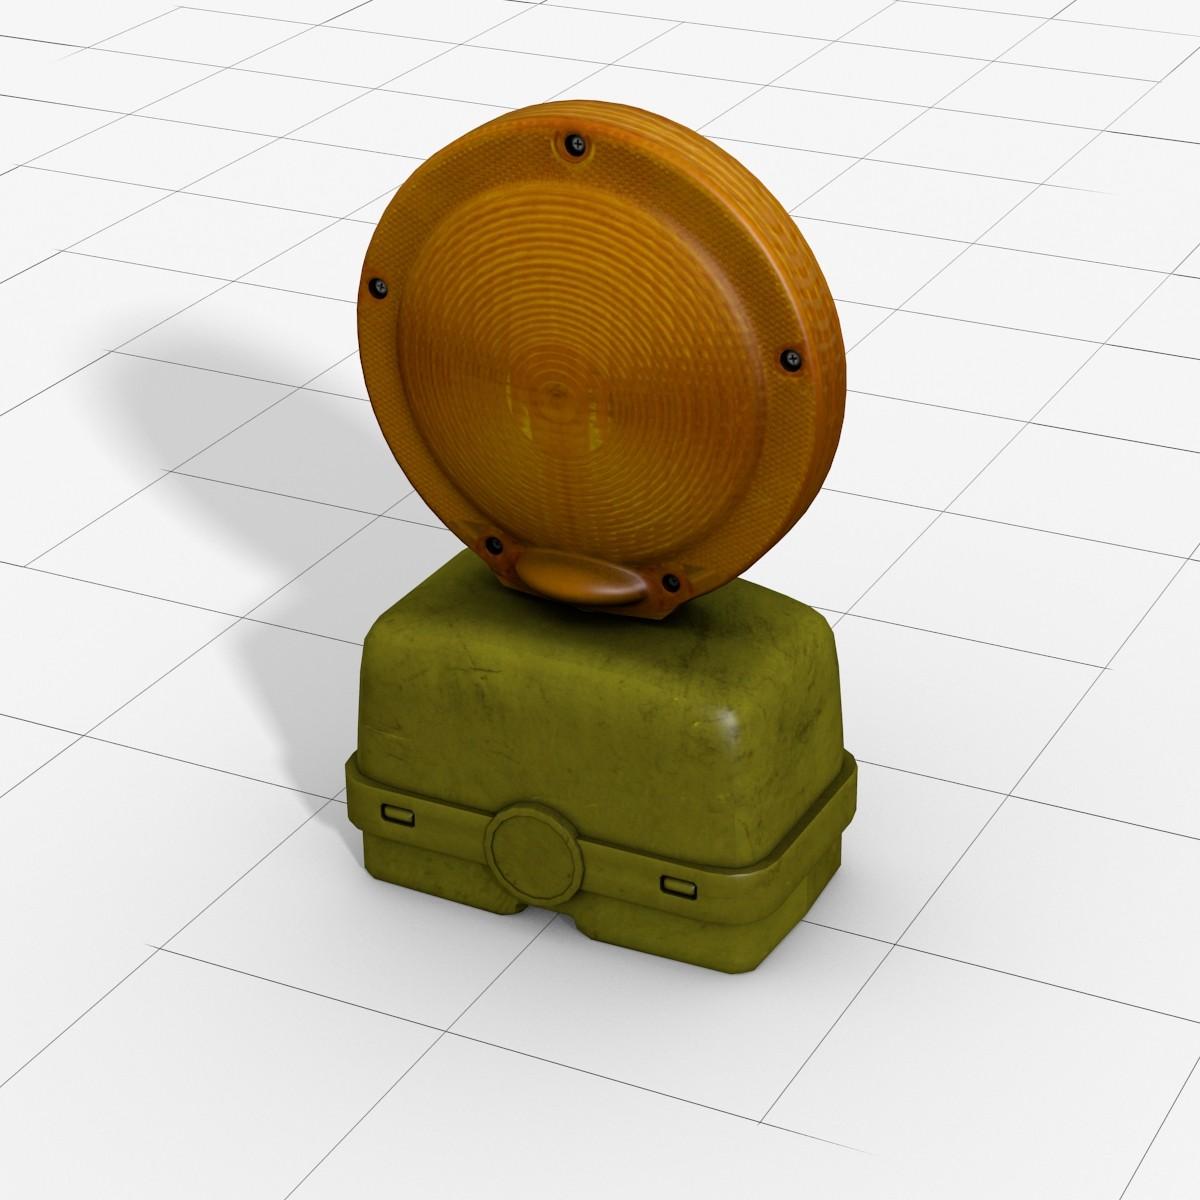 Barricade Flasher_3d Model.jpg